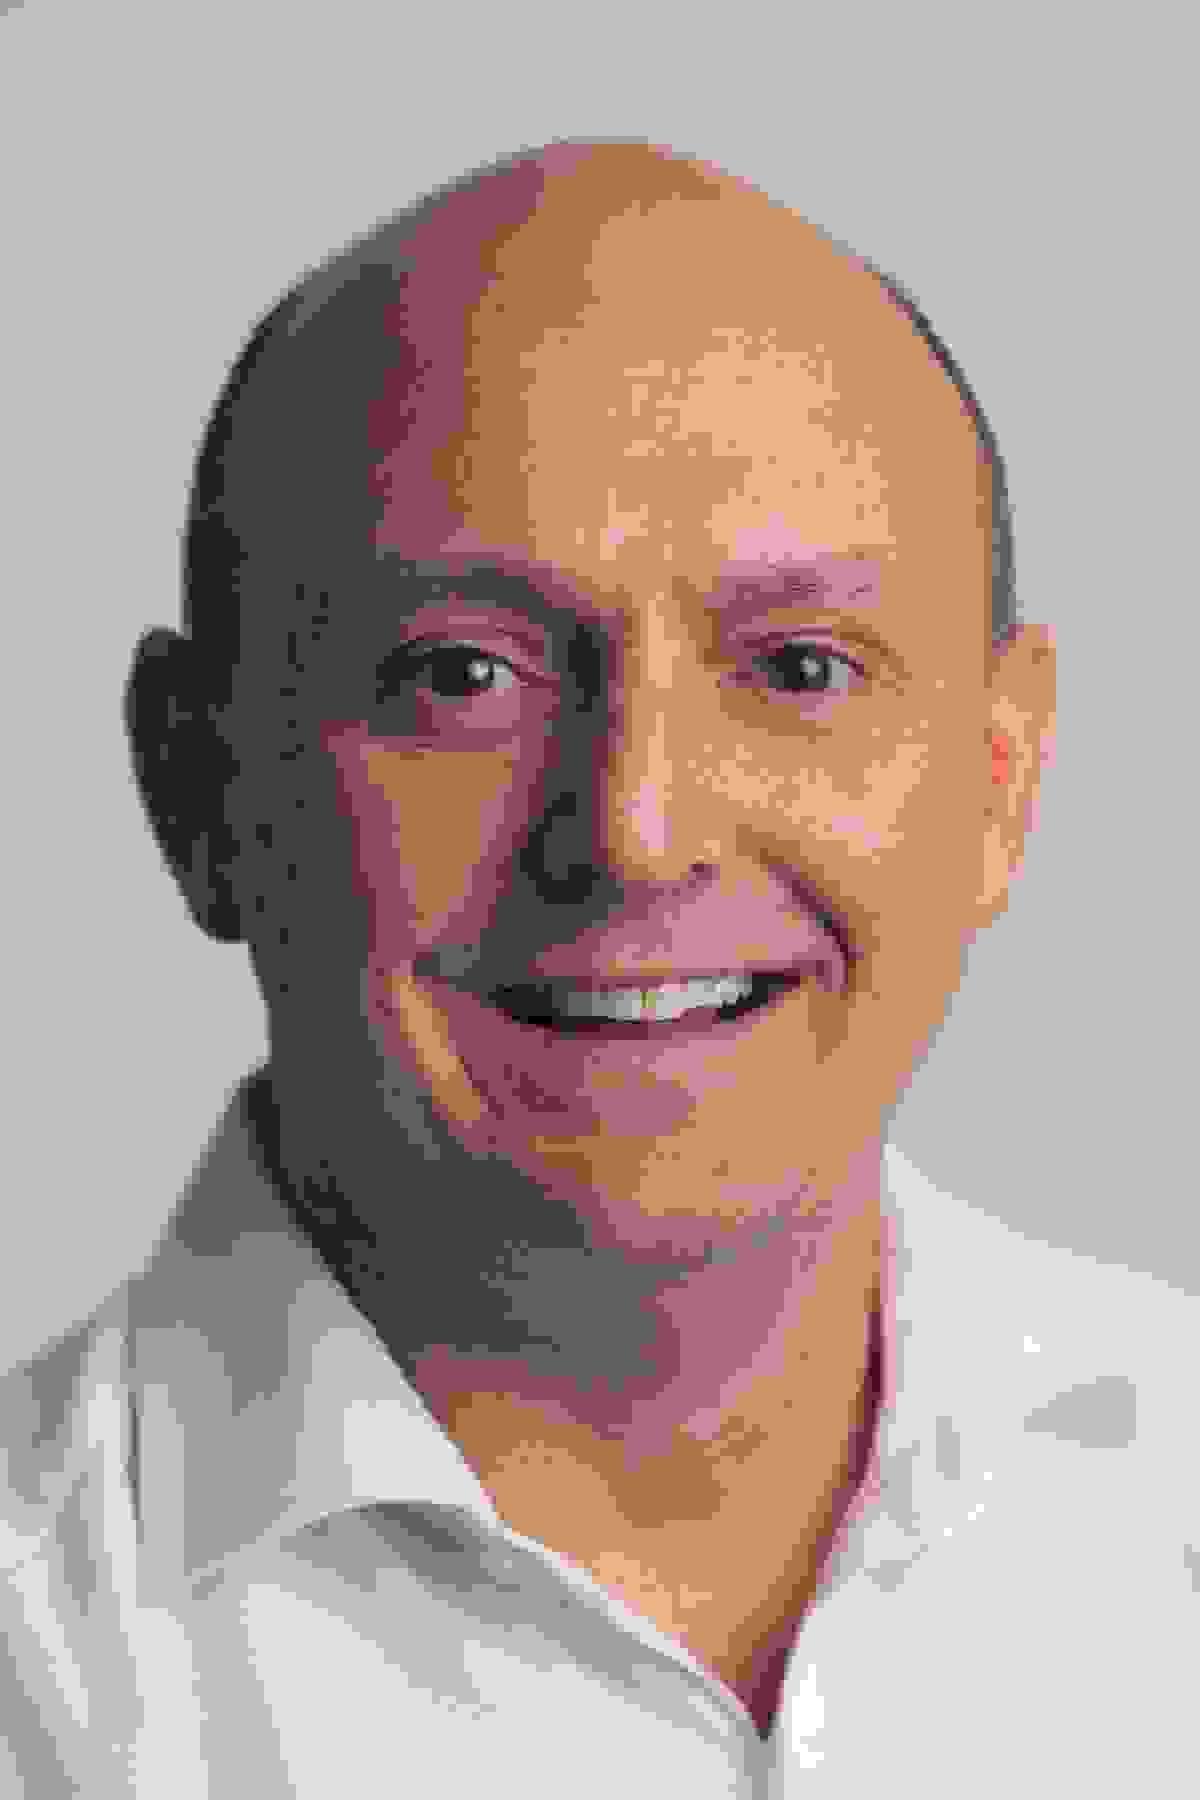 Richard Denniss: Curing Affluenza